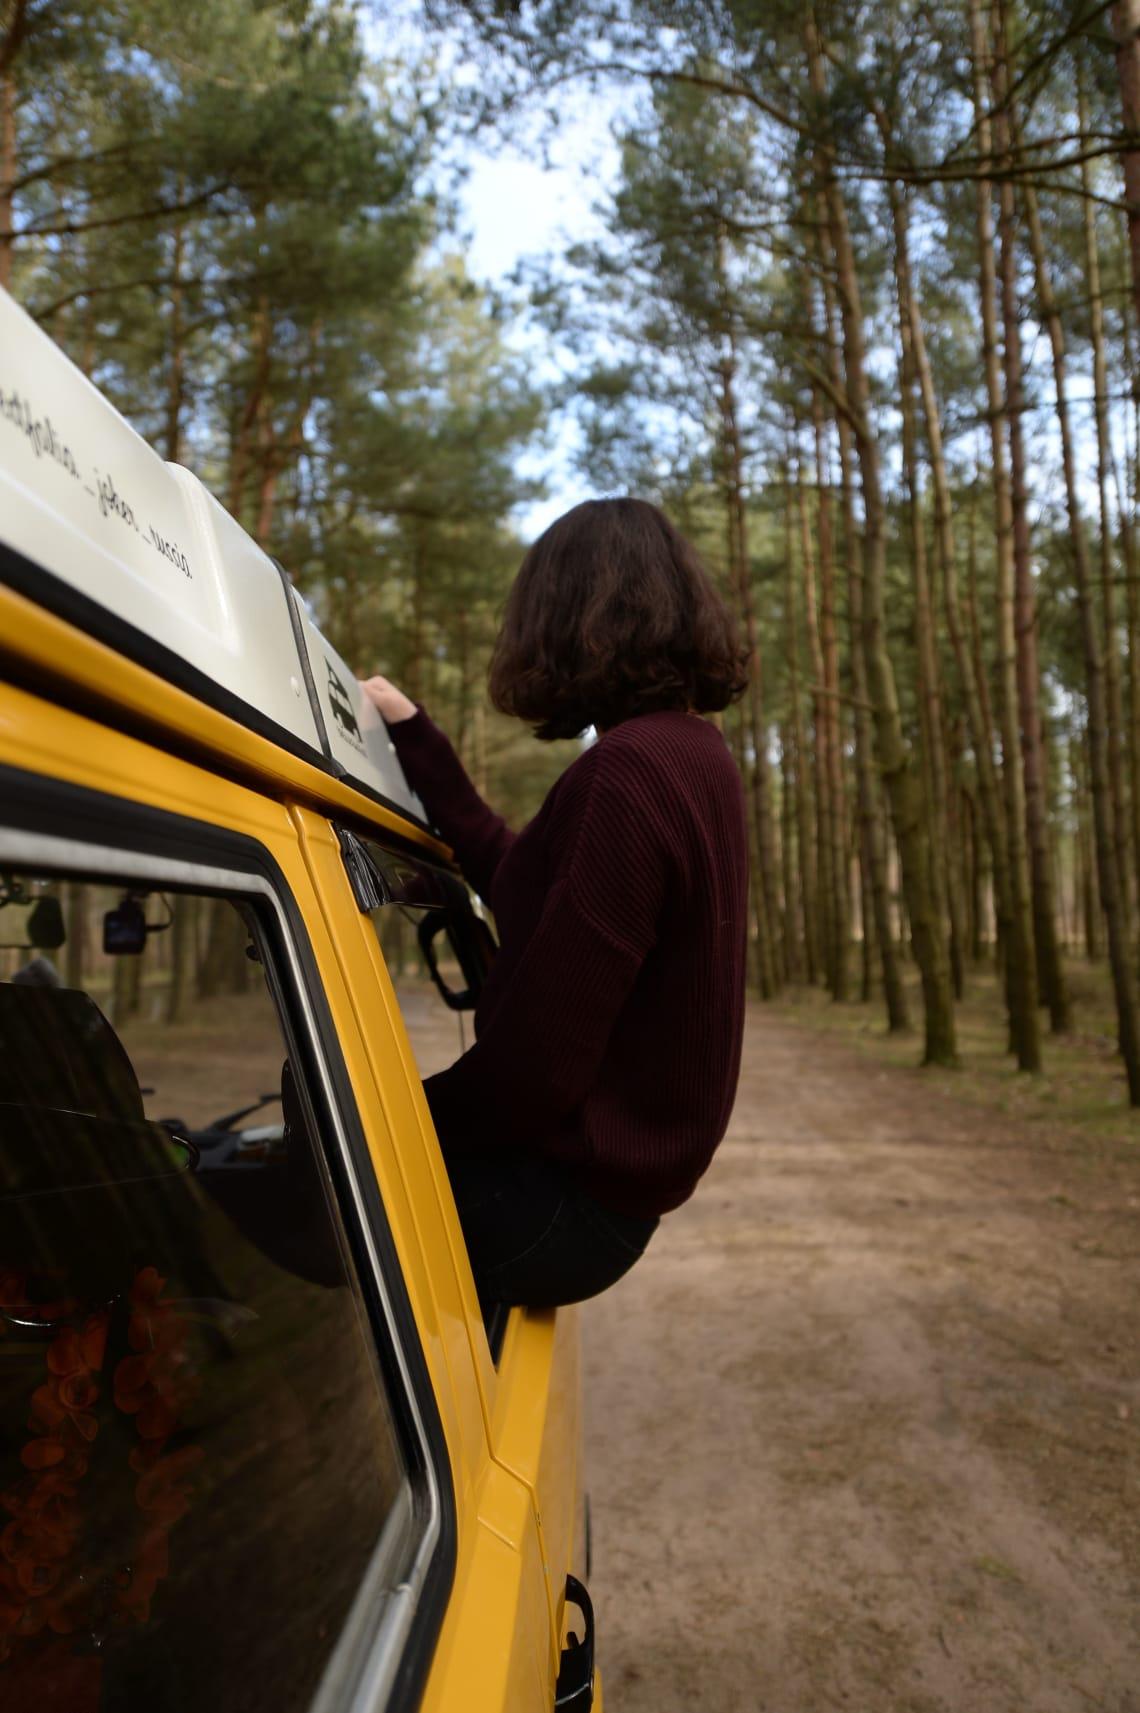 Traveler enjoying a road trip through tall tees